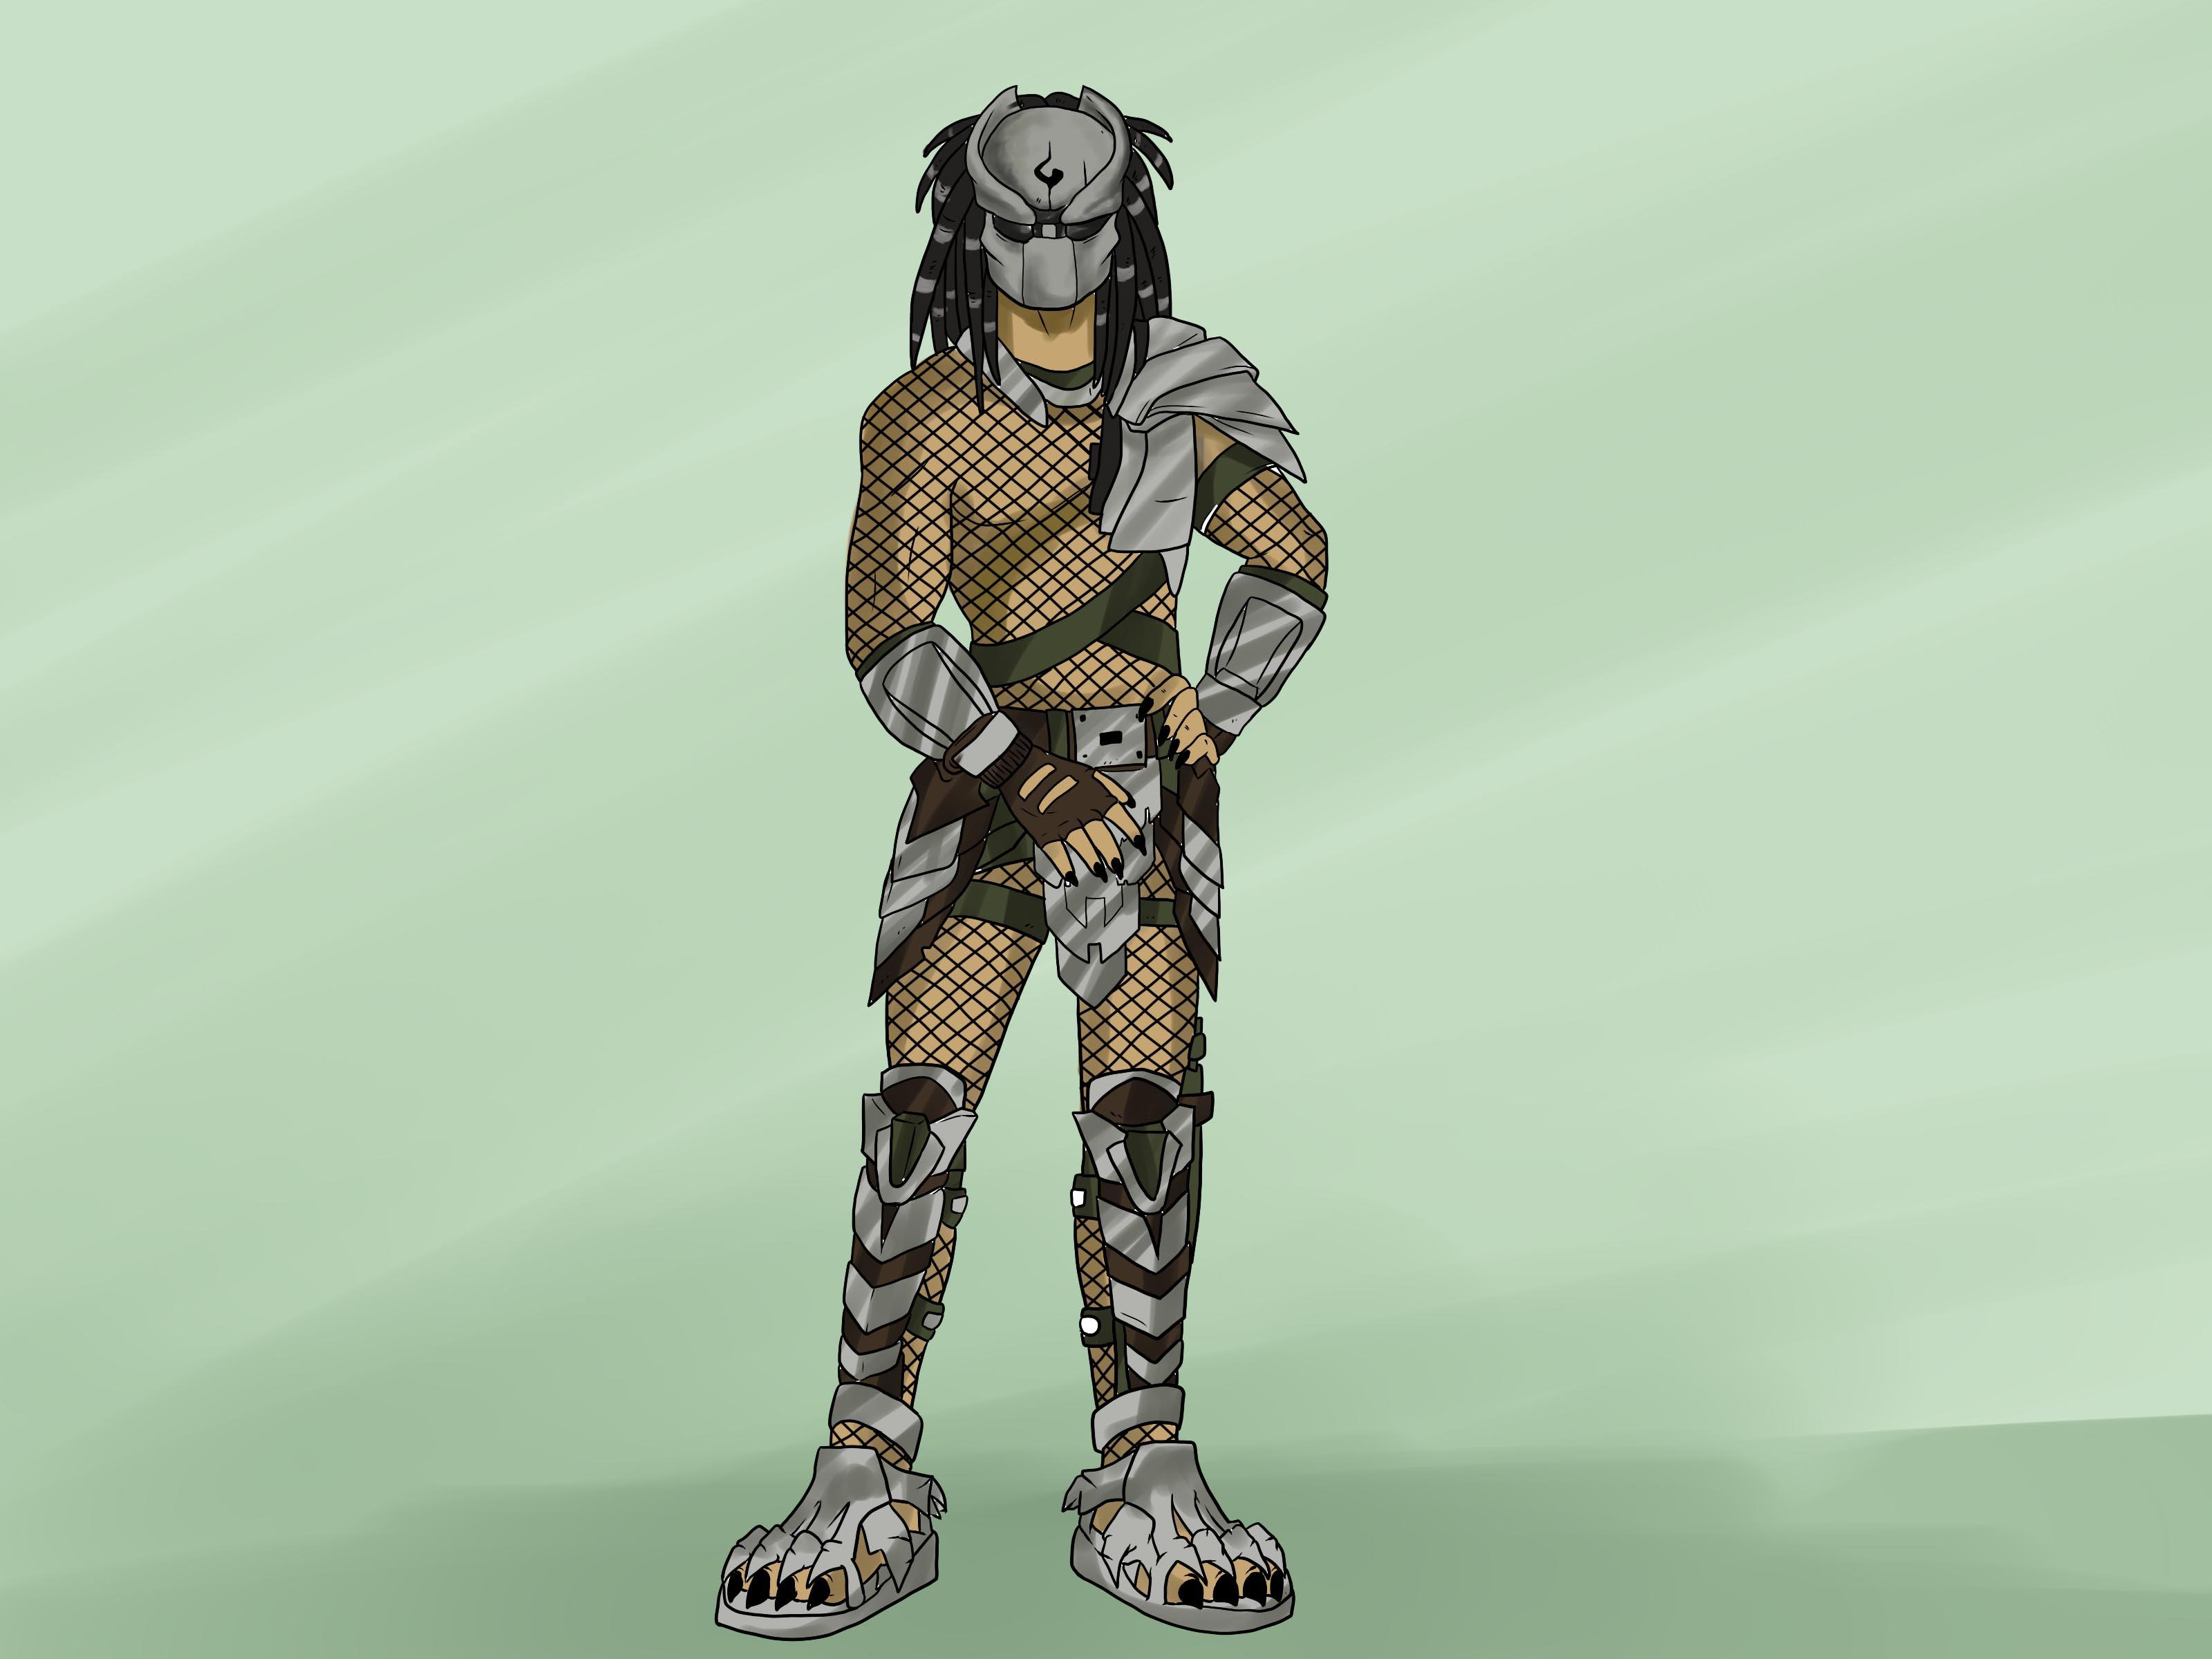 Drawn predator drawing WikiHow Predator (with to Draw